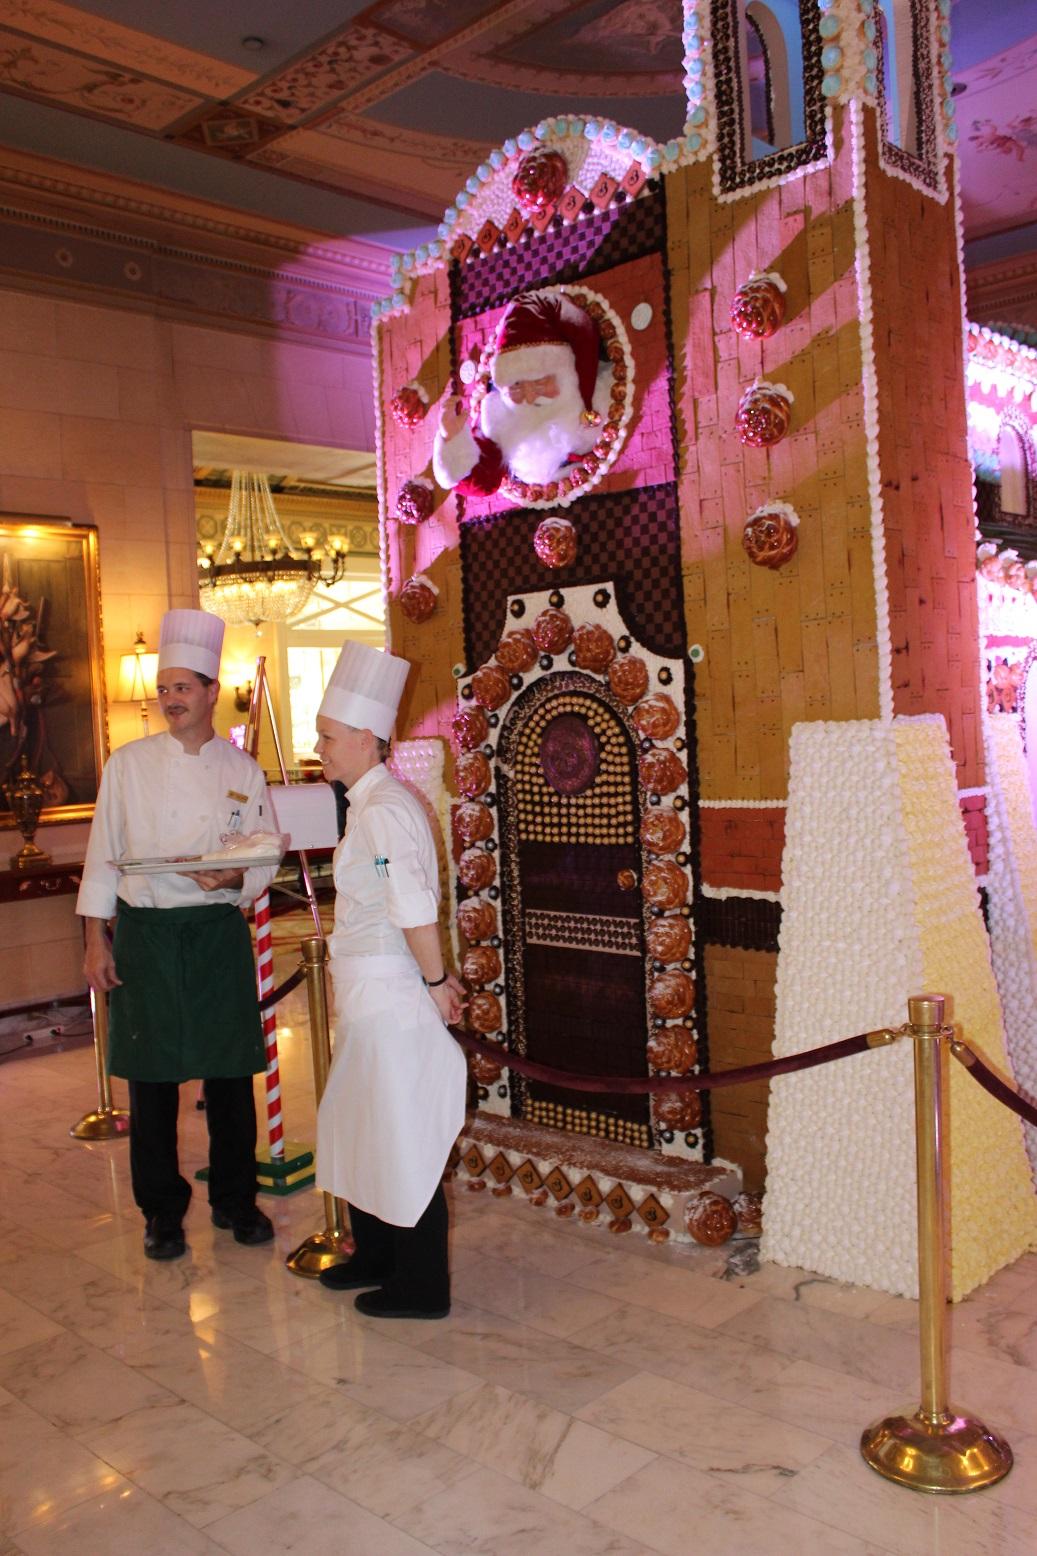 Broadmoor chefs Douglas Slape and Erin McIllwain at work on the gingerbread chapel